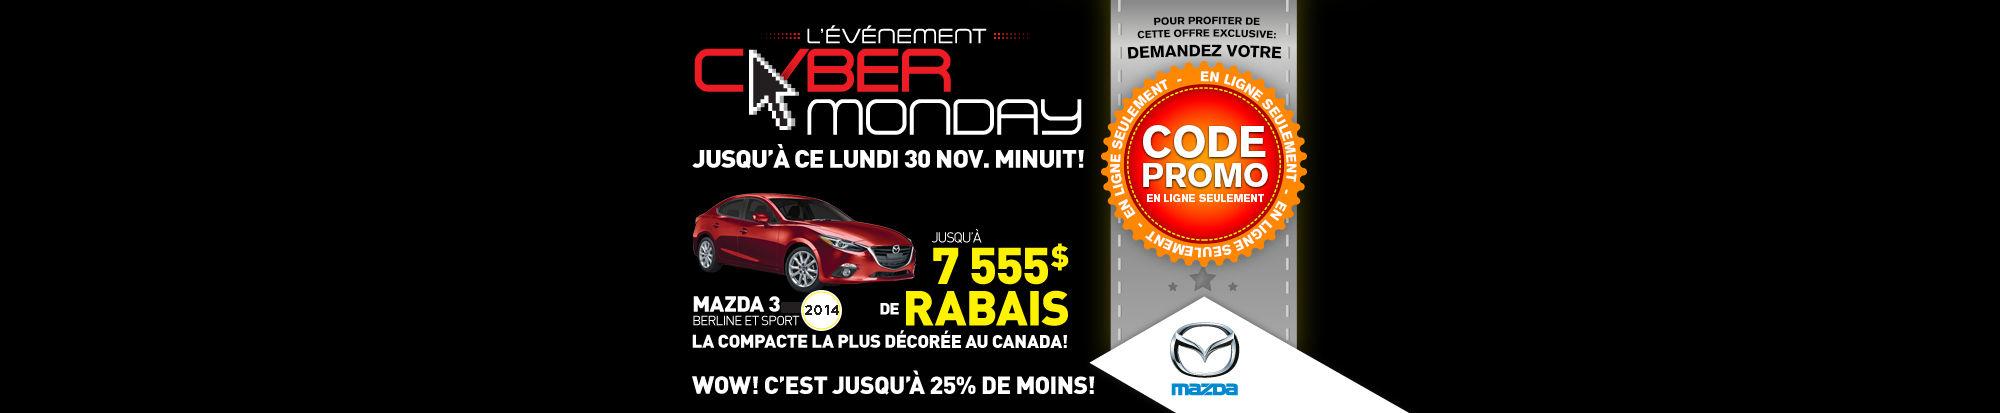 Mazda - Cyber Monday